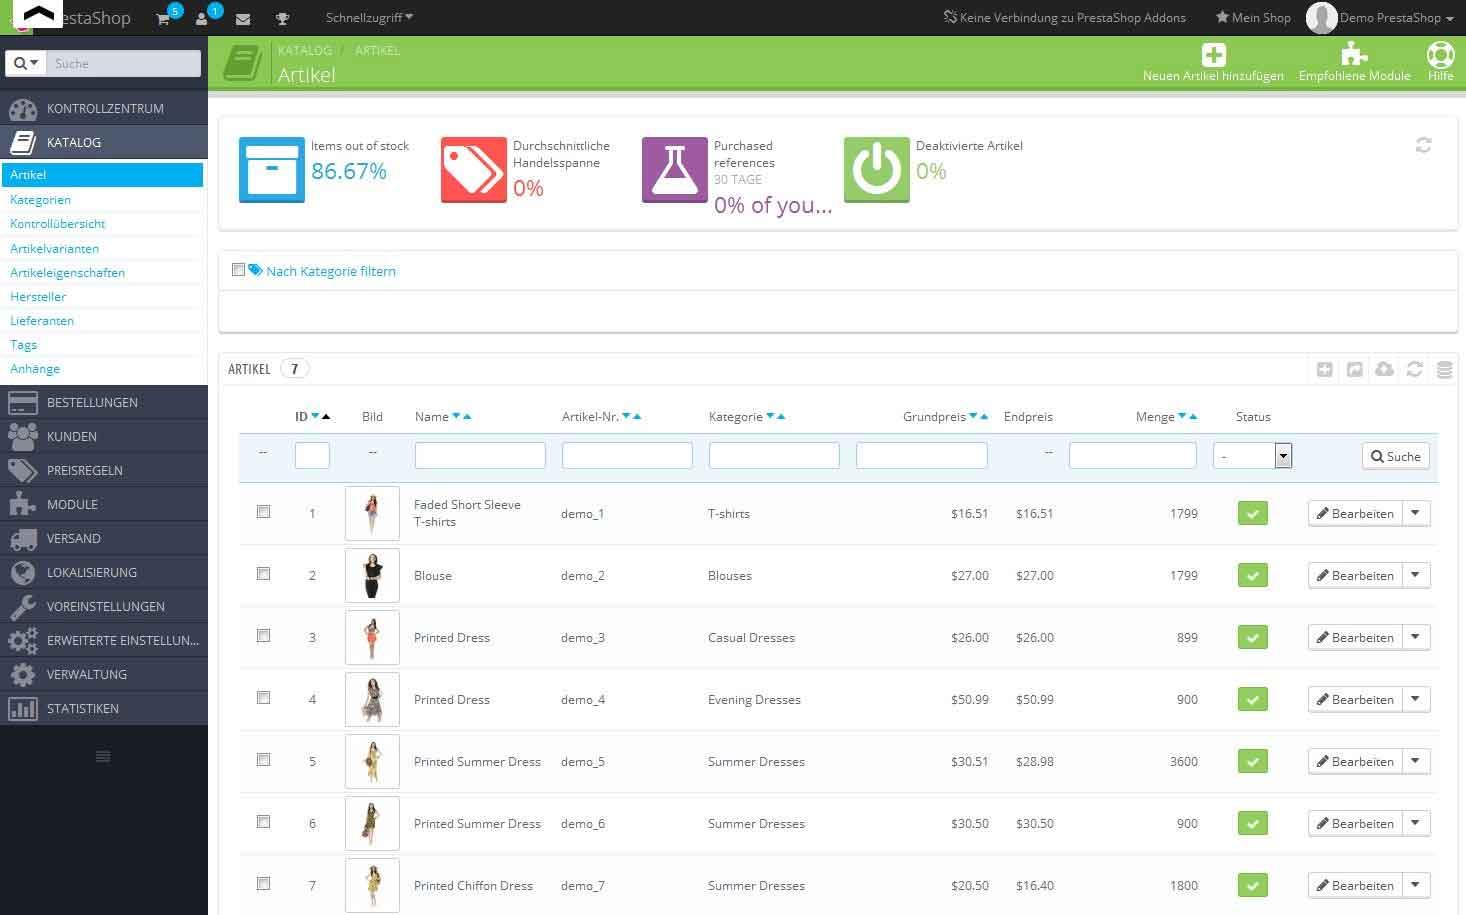 PrestaShop: Artikelkatalog-Verwaltung